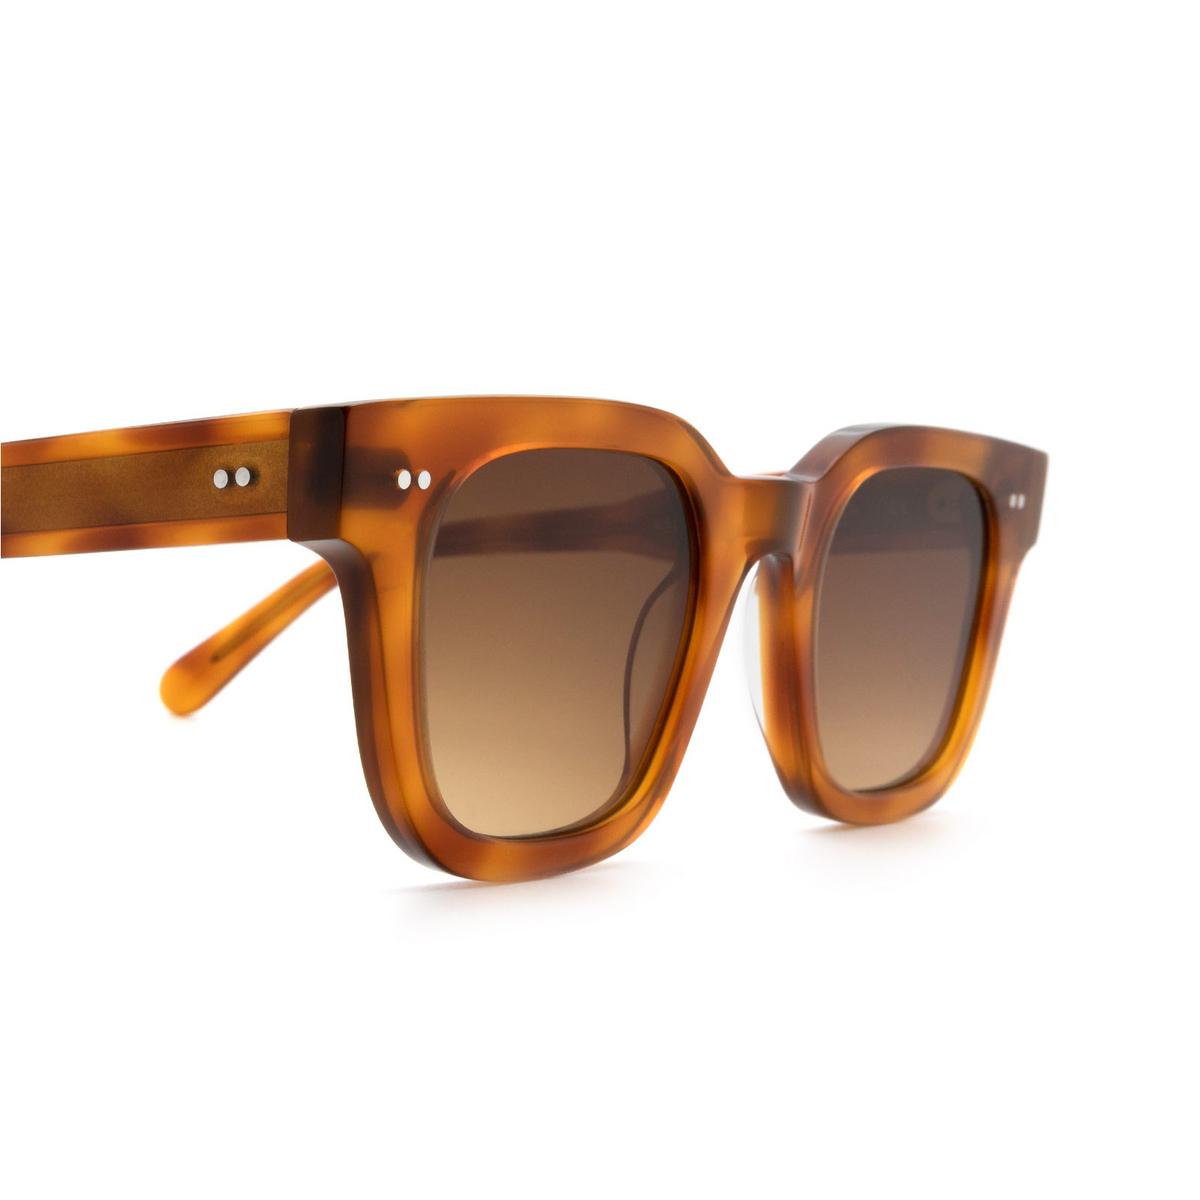 Chimi® Square Sunglasses: 04 color Havana - three-quarters view.